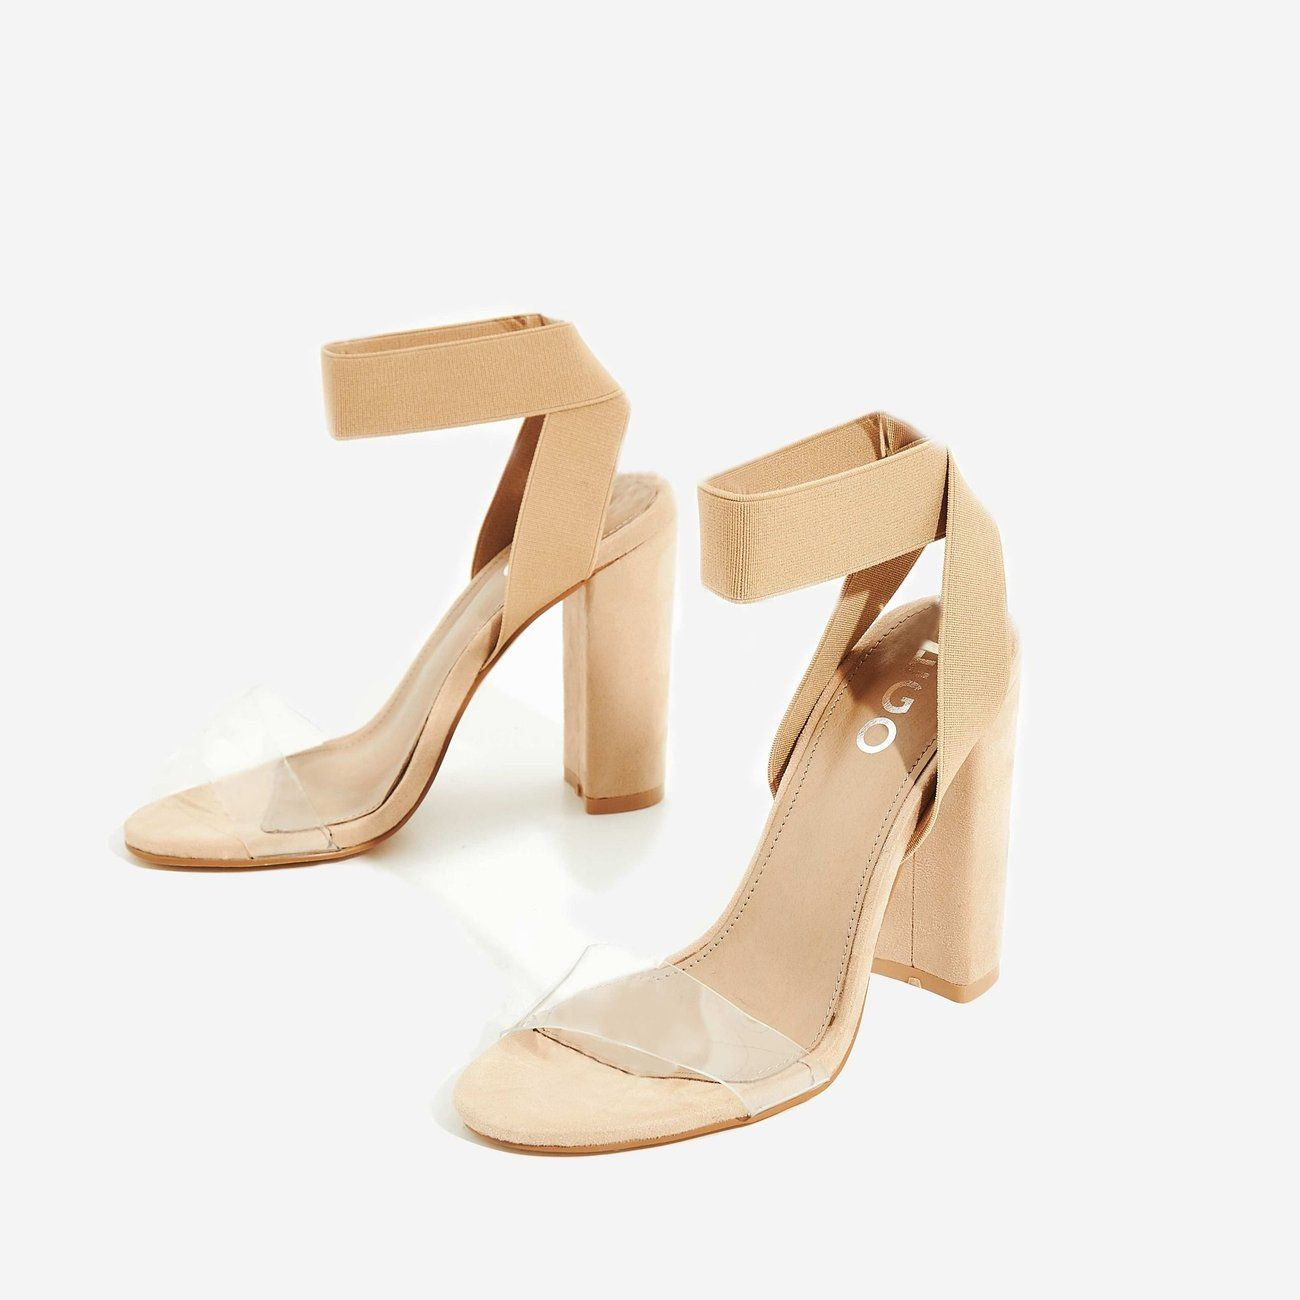 8f1c385669ade Tory Perspex Detail Block Heel In Nude Faux Suede | EGO | Shoe ...